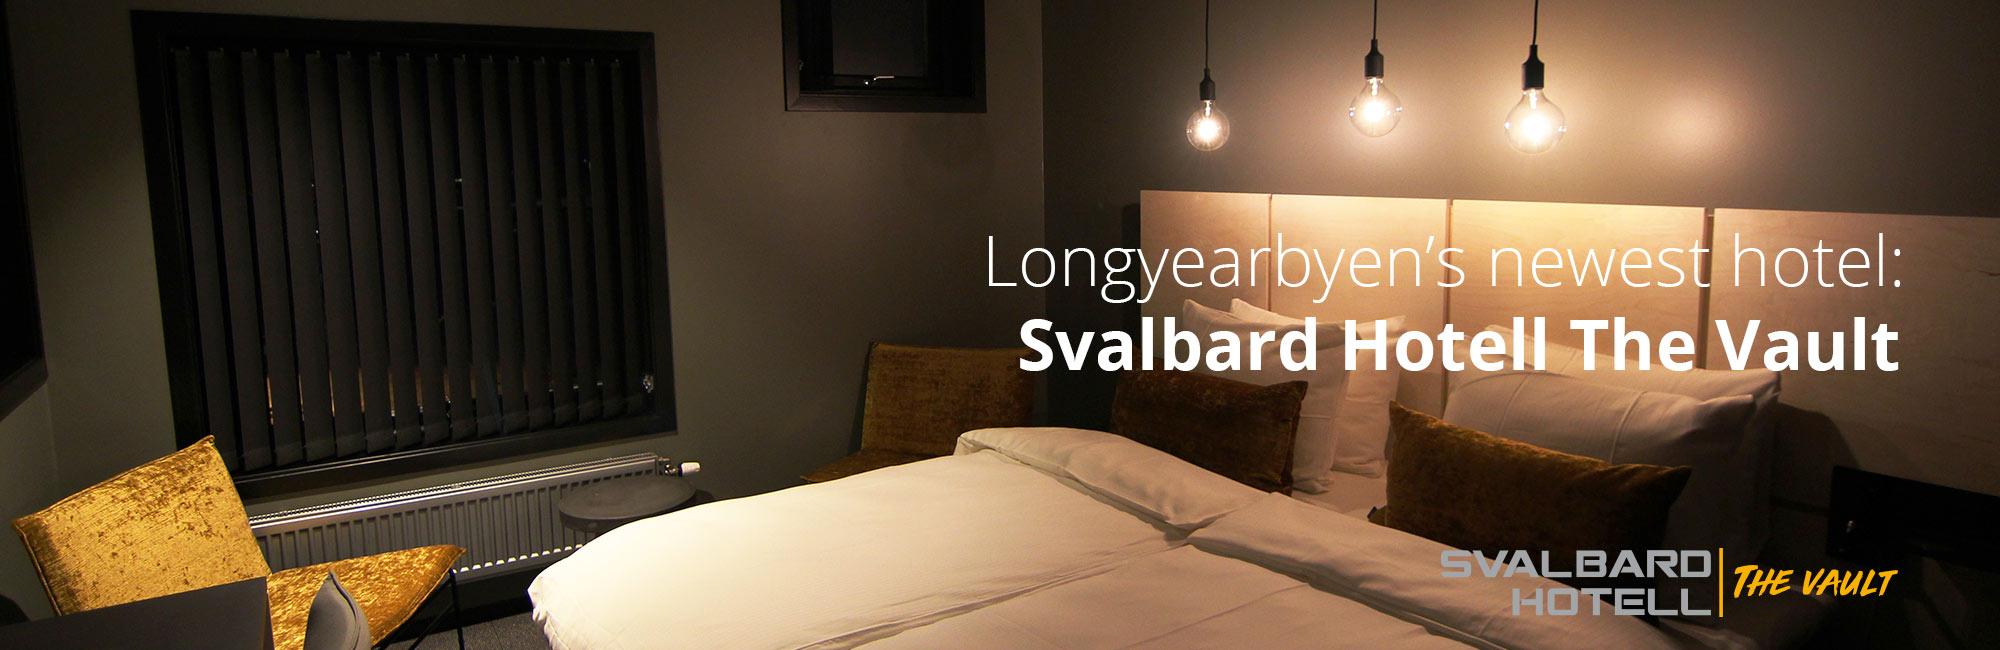 Svalbard Hotel The Vault